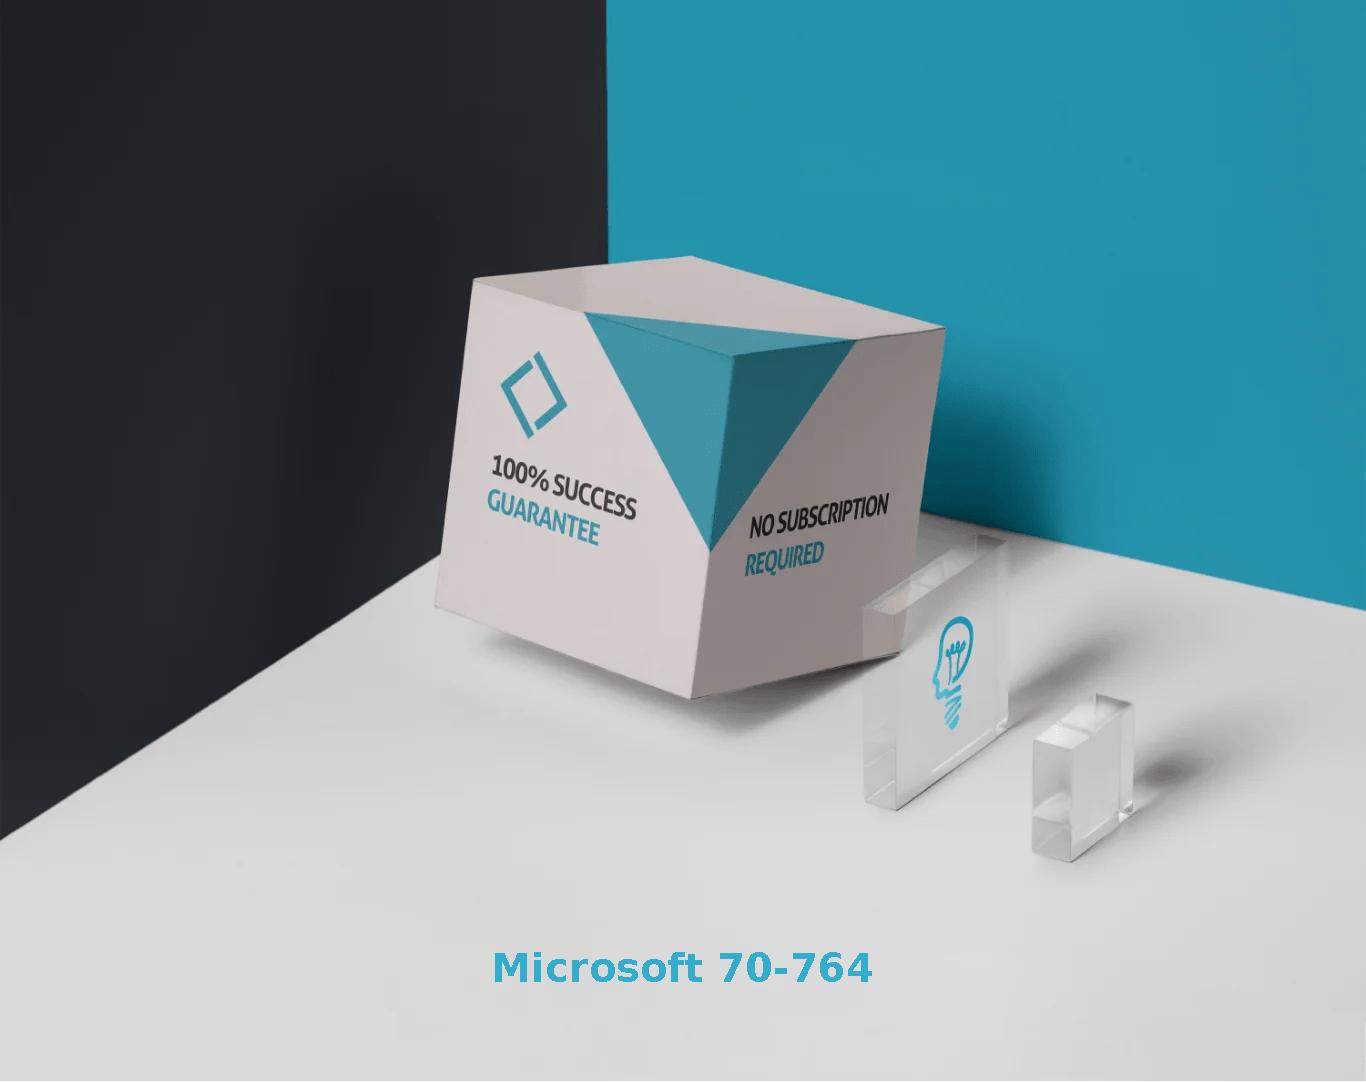 Microsoft 70-764 Exams